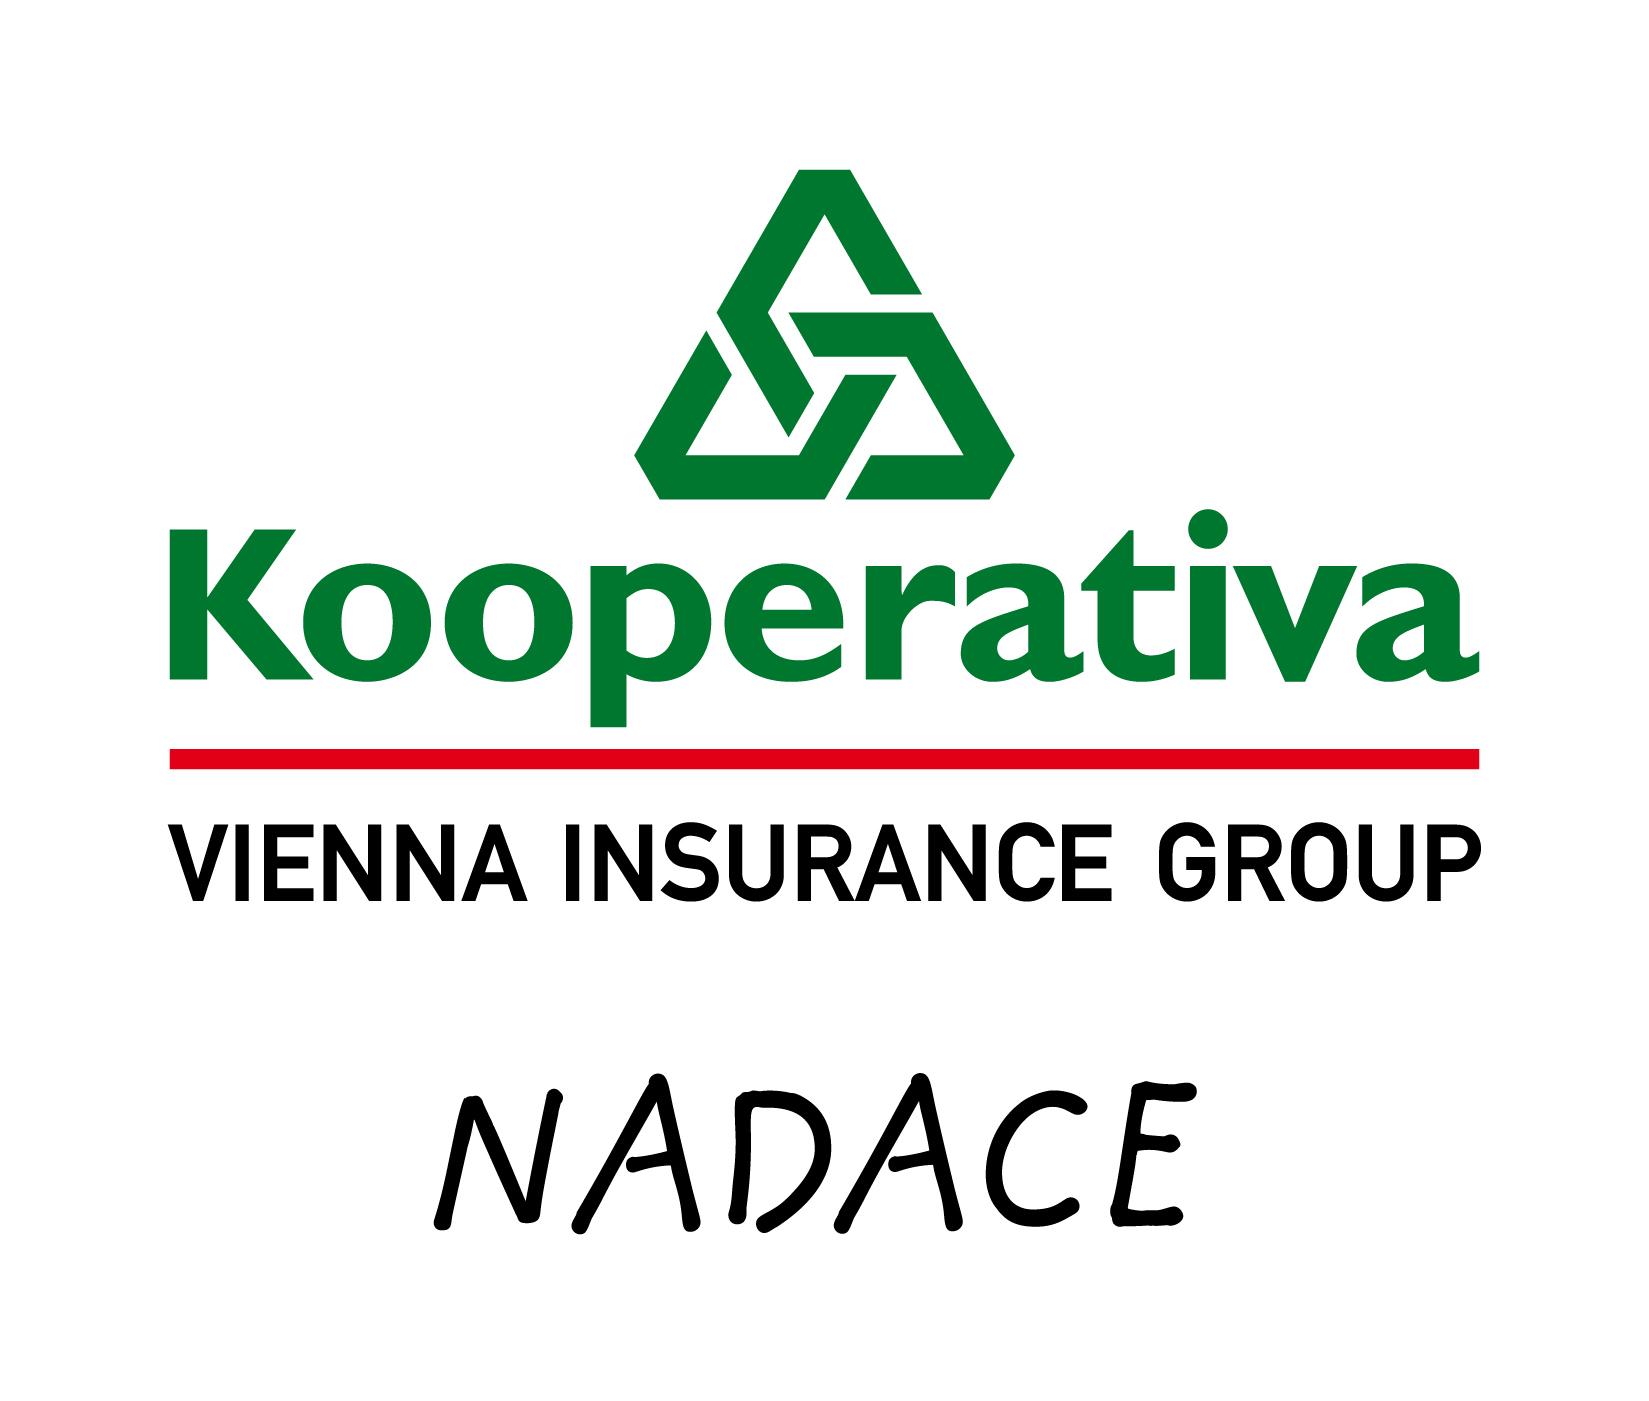 Kooperativa Nadace